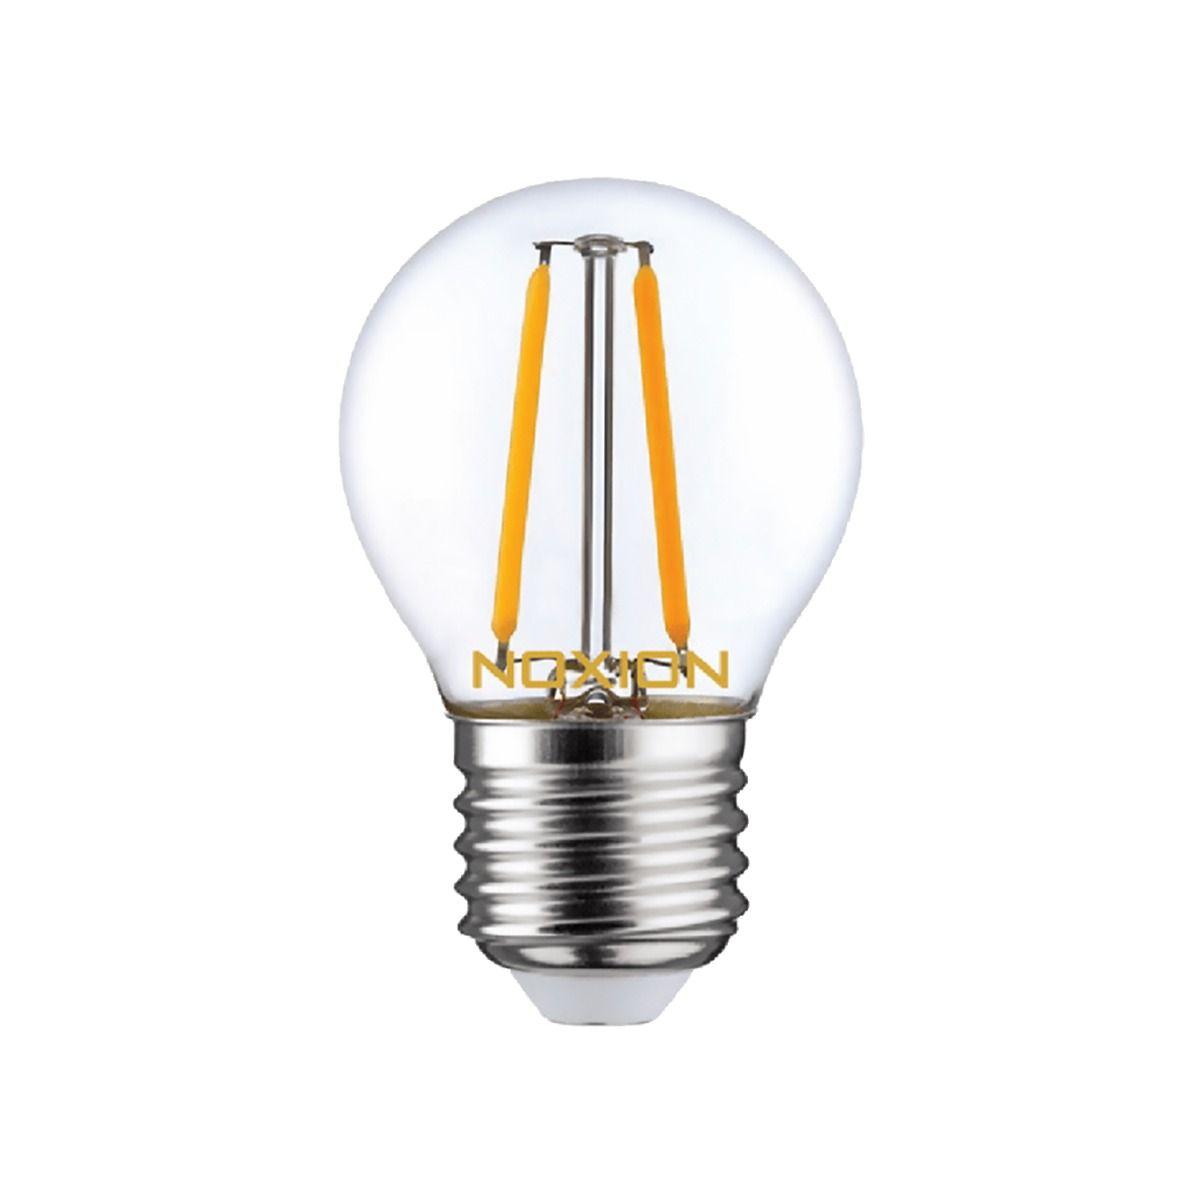 Noxion Lucent LED Lustre E27 2.5W 827 con Filamento | Luz muy Cálida - Regulable - Reemplazo 25W